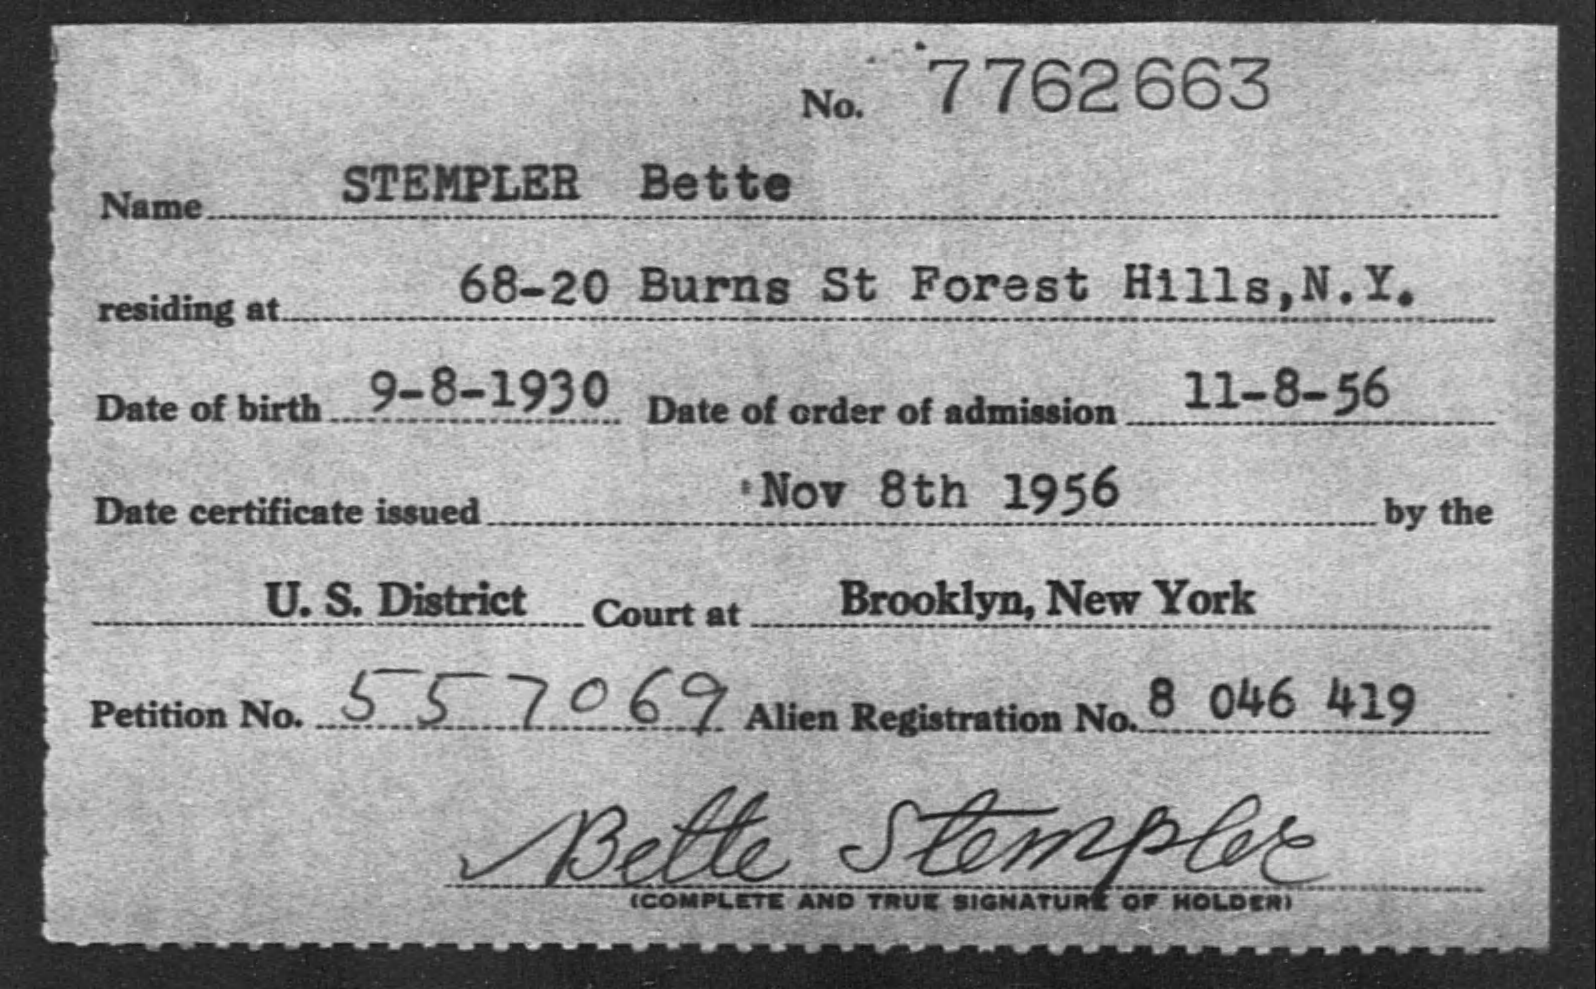 STEMPLER Bette - Born: 1930, Naturalized: 1956